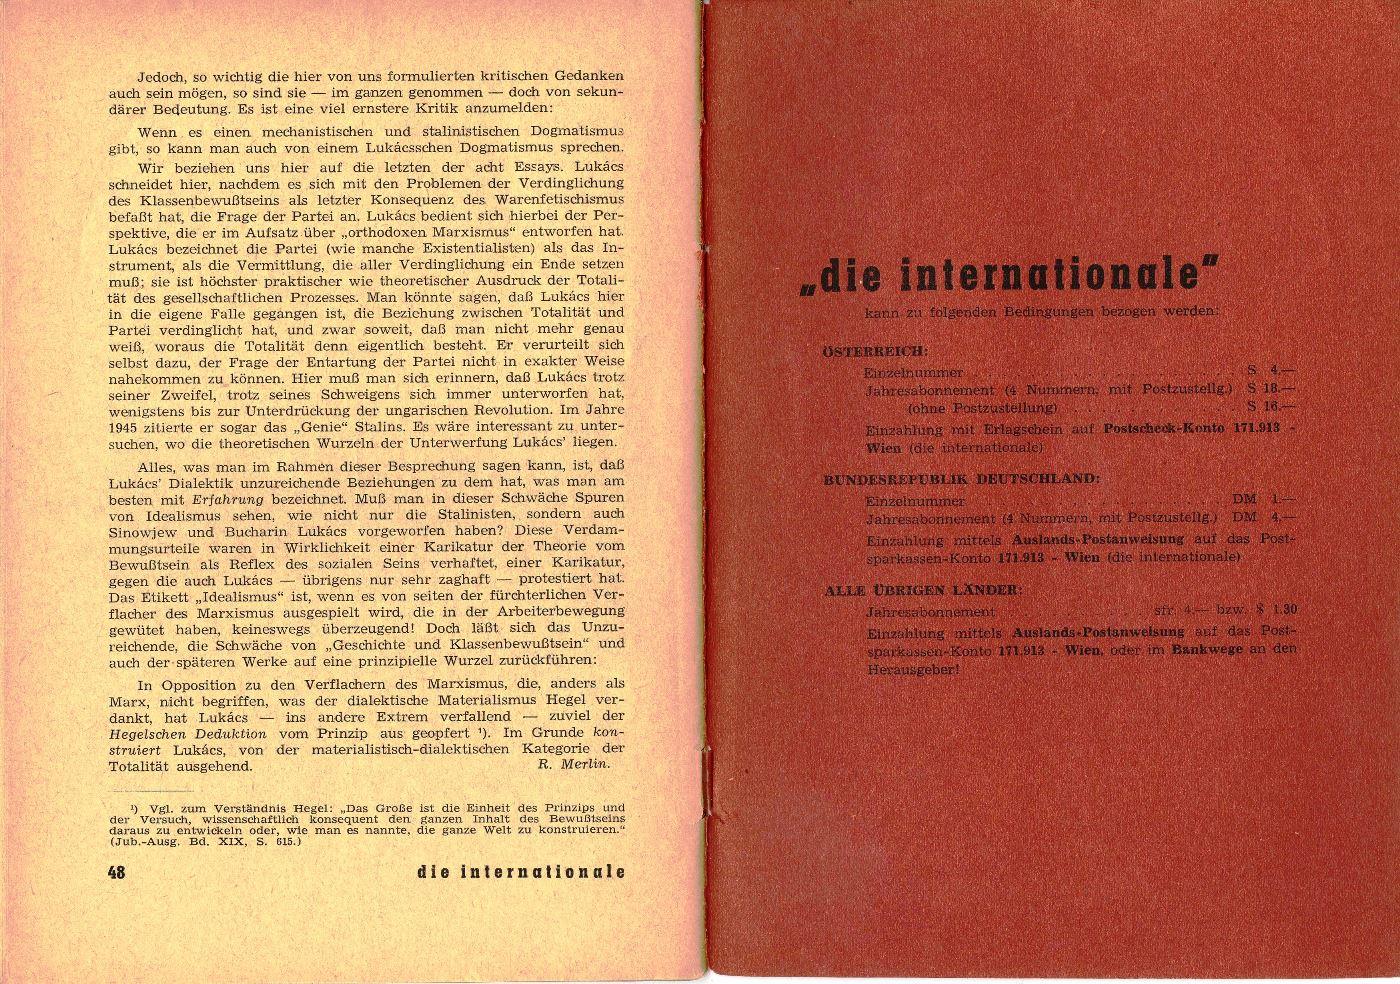 GIM_Internationale_294